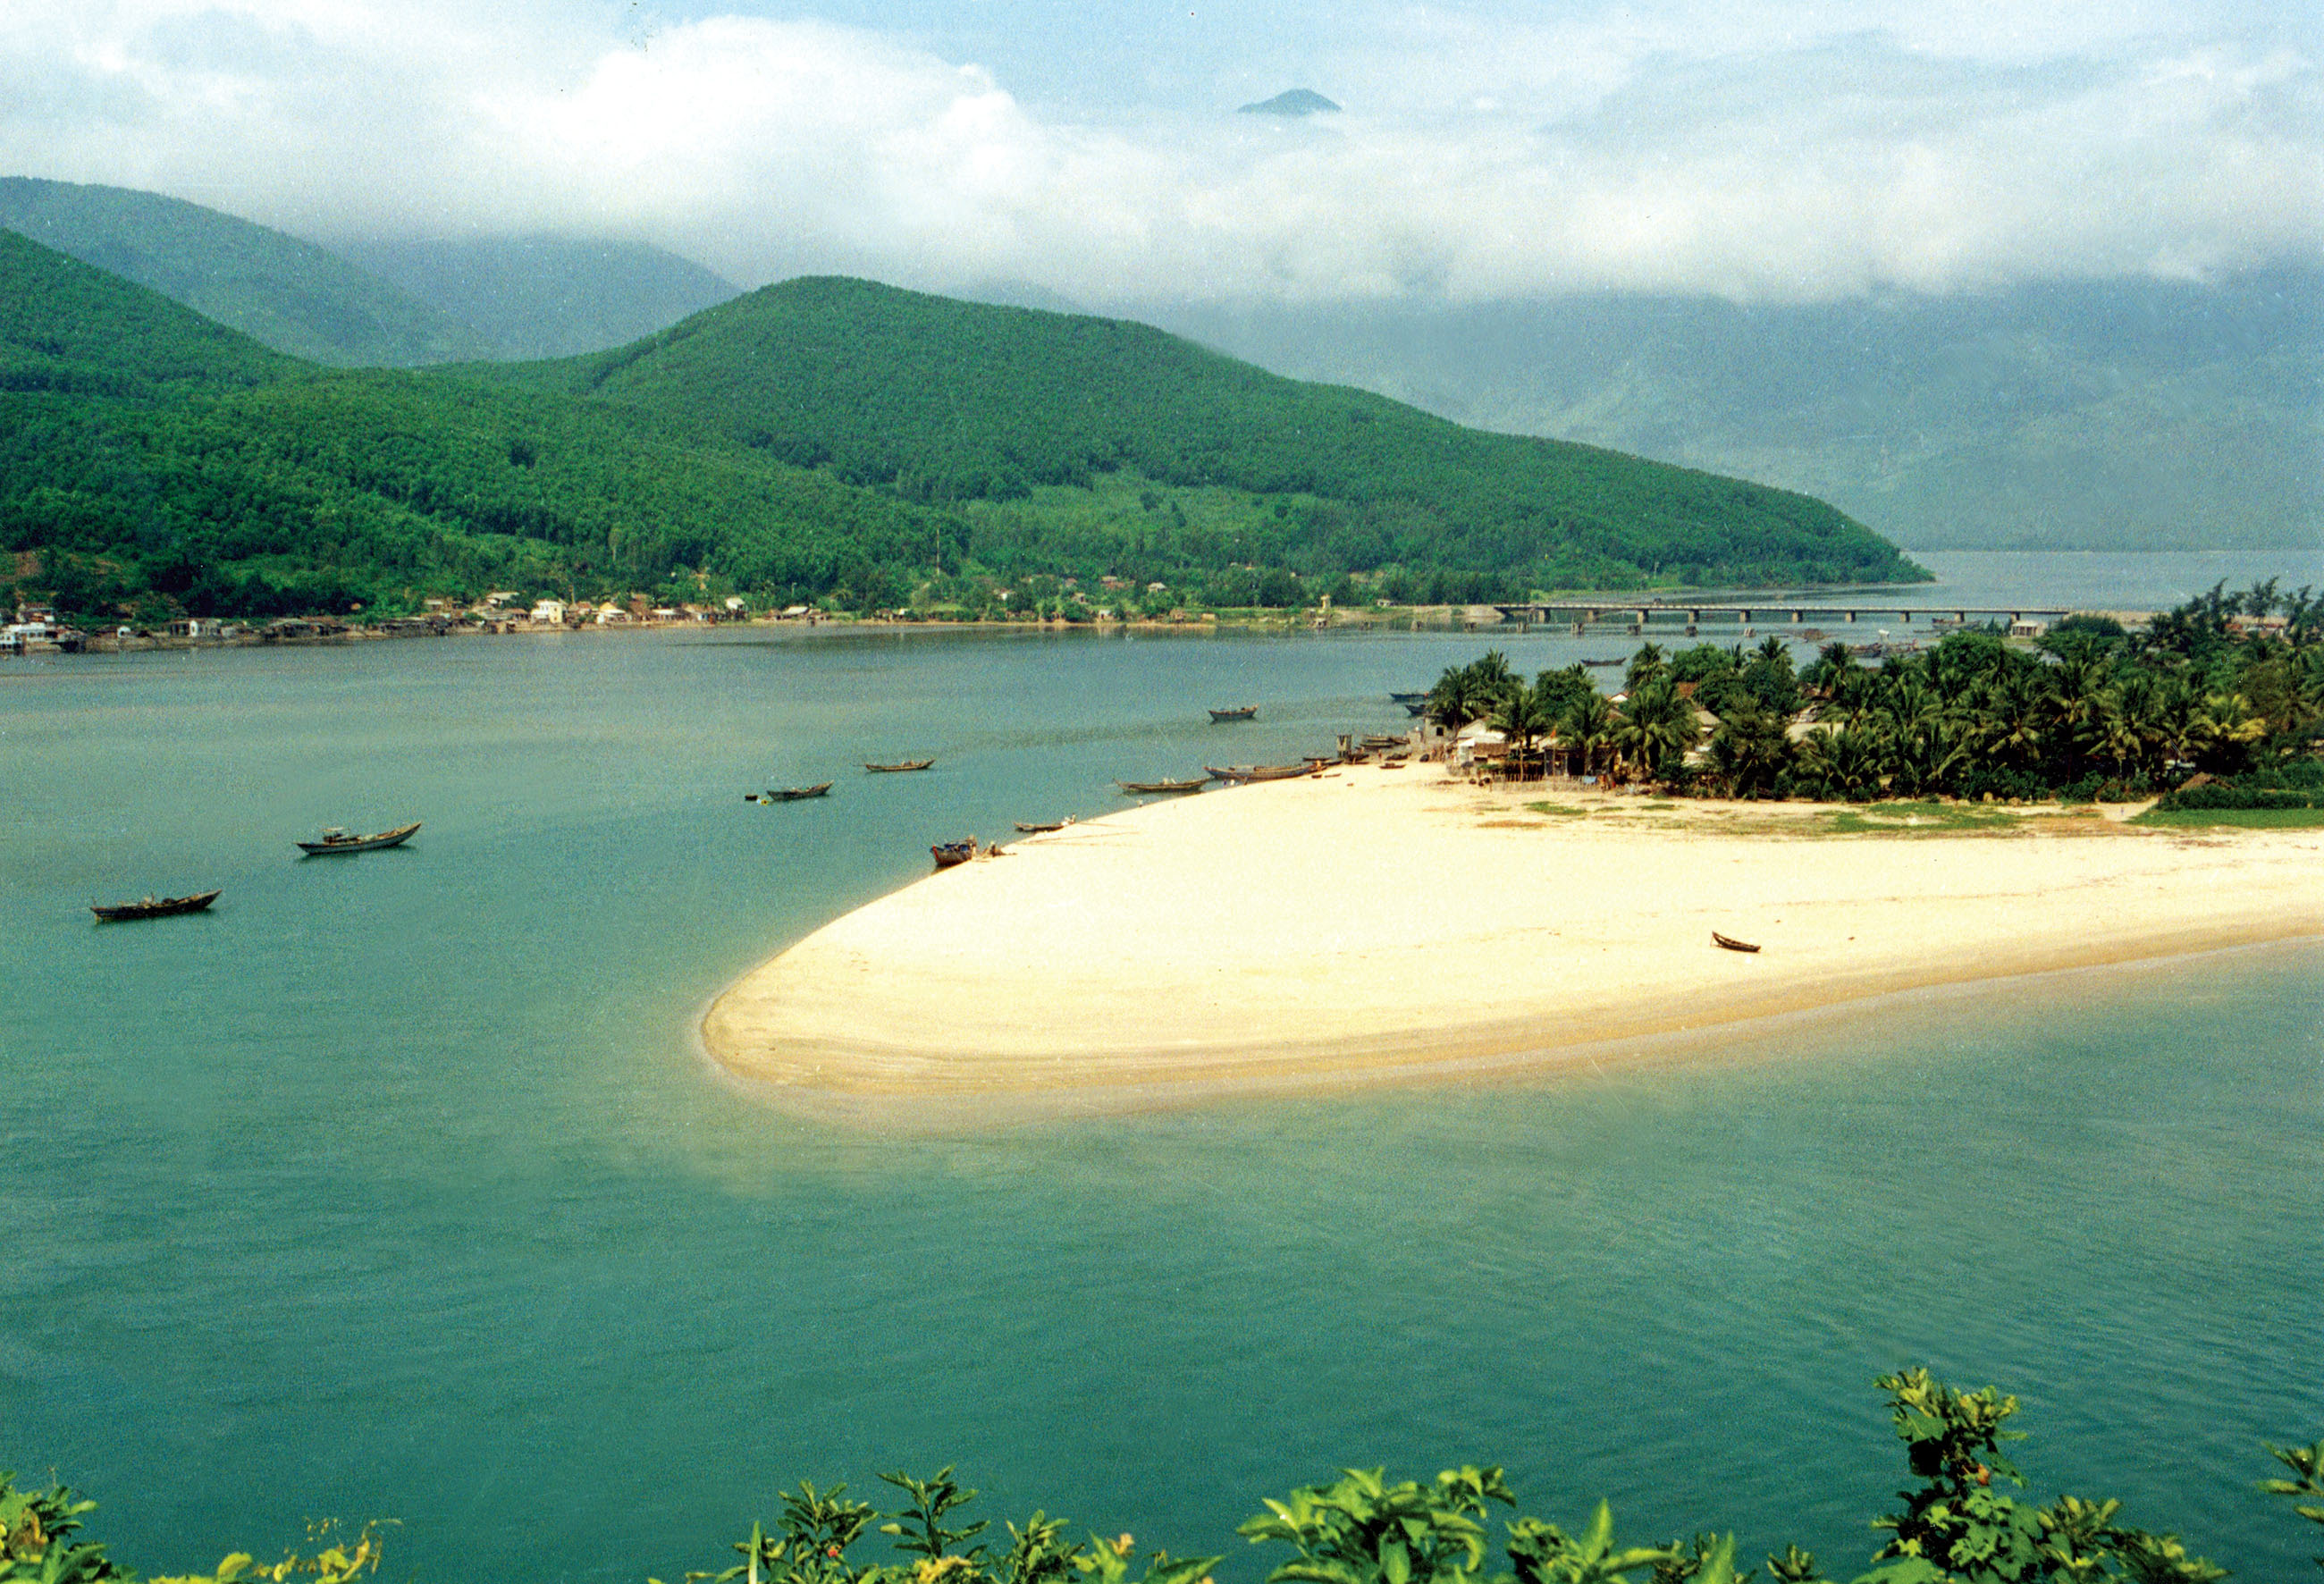 Day 5: Hue - Danang - Hoi An (B/L/)